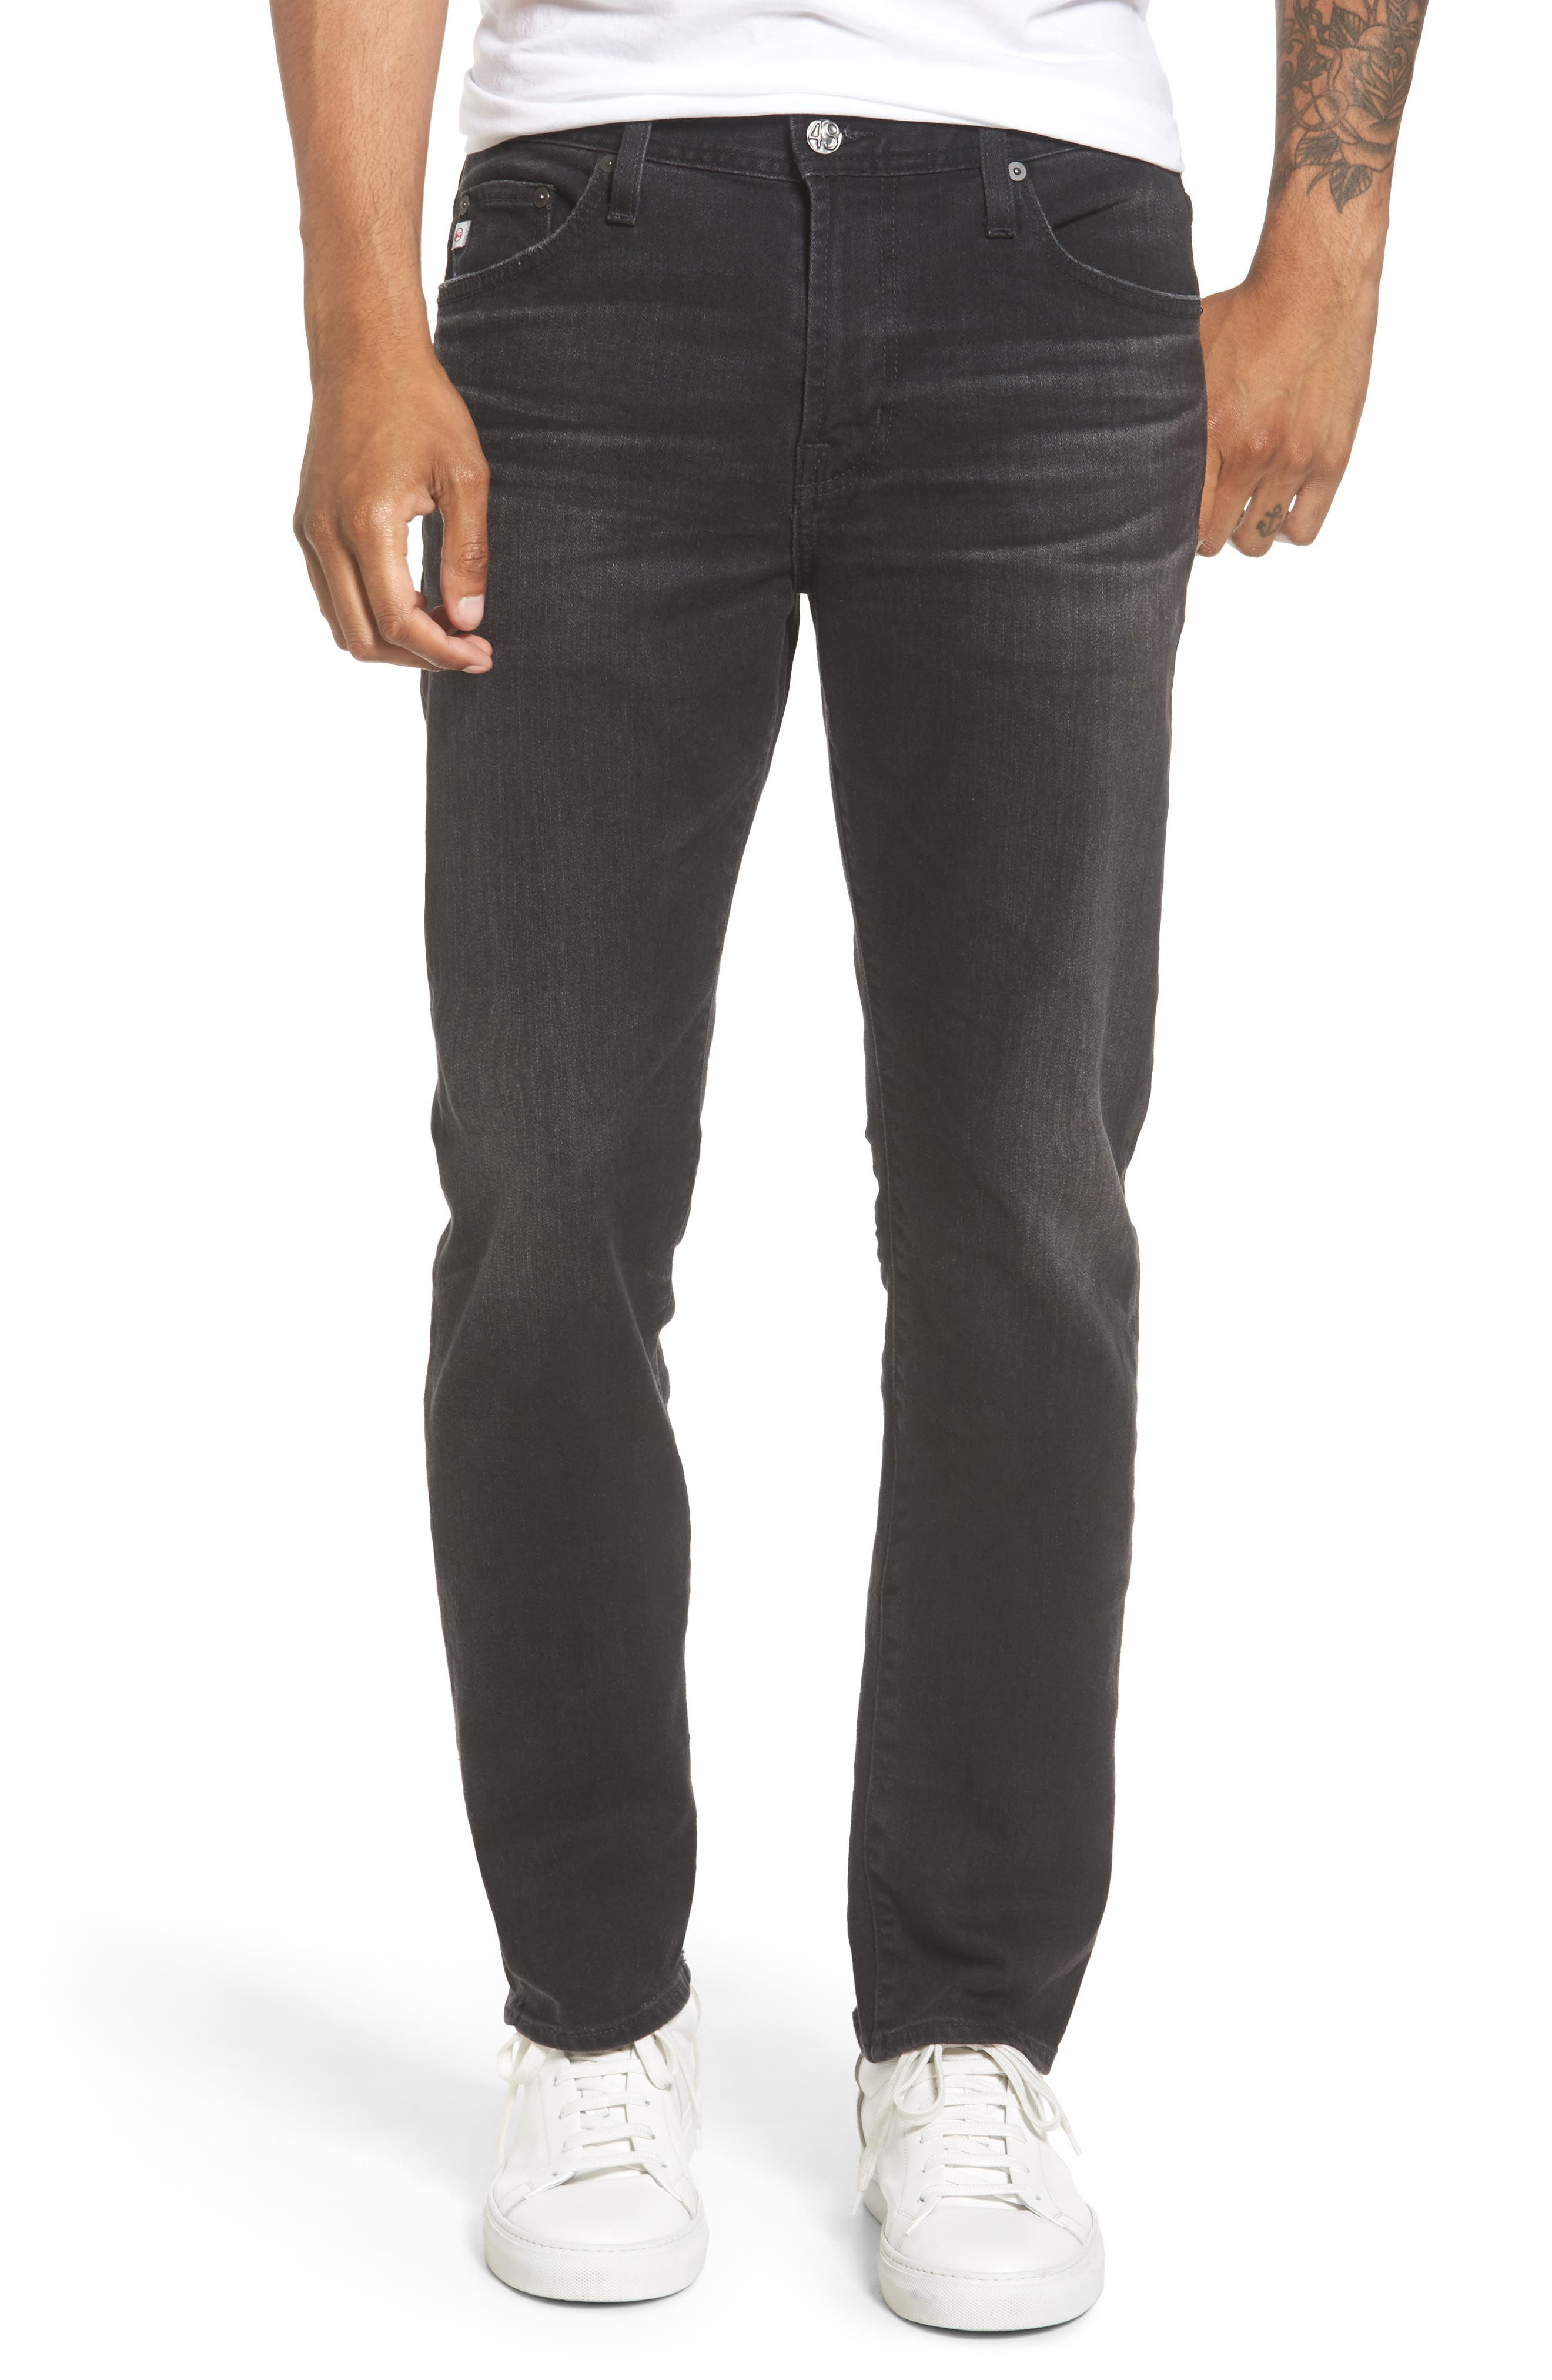 Everett Slim Straight Leg Jeans,                         Main,                         color, 4 Years Down